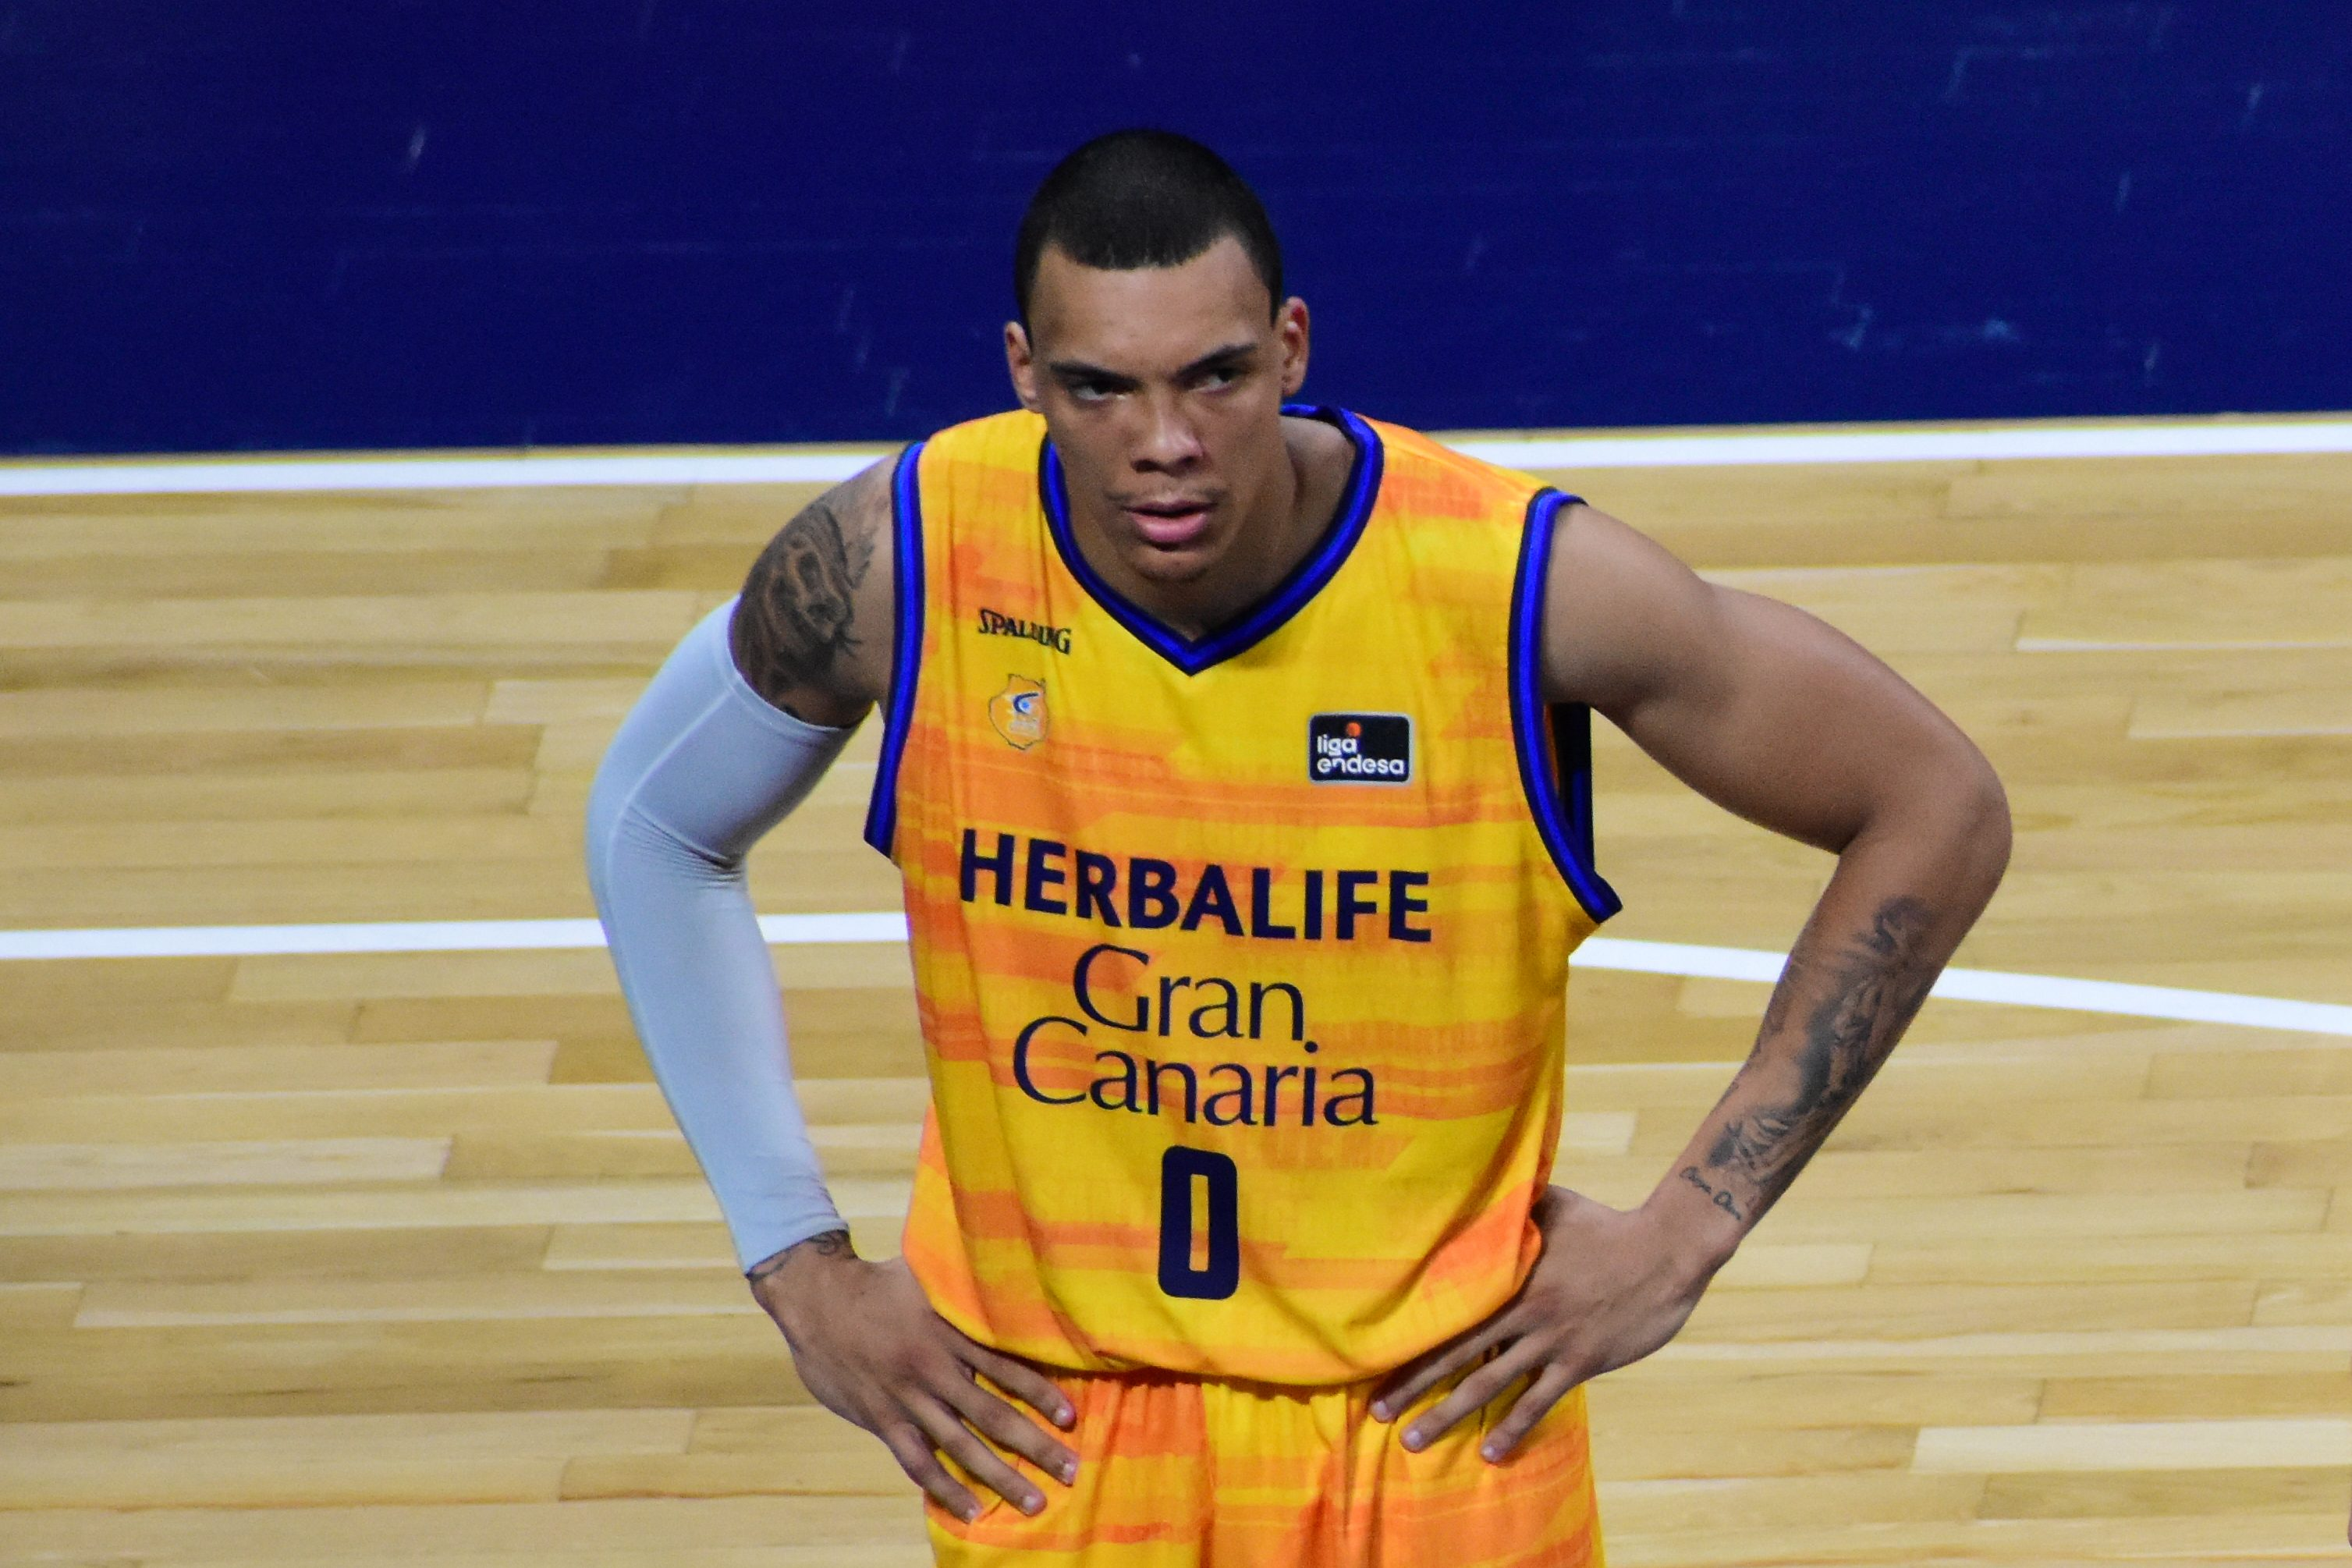 Gran Canaria-Claret cede a Jacob Wiley al Basket Zaragoza hasta final de temporada